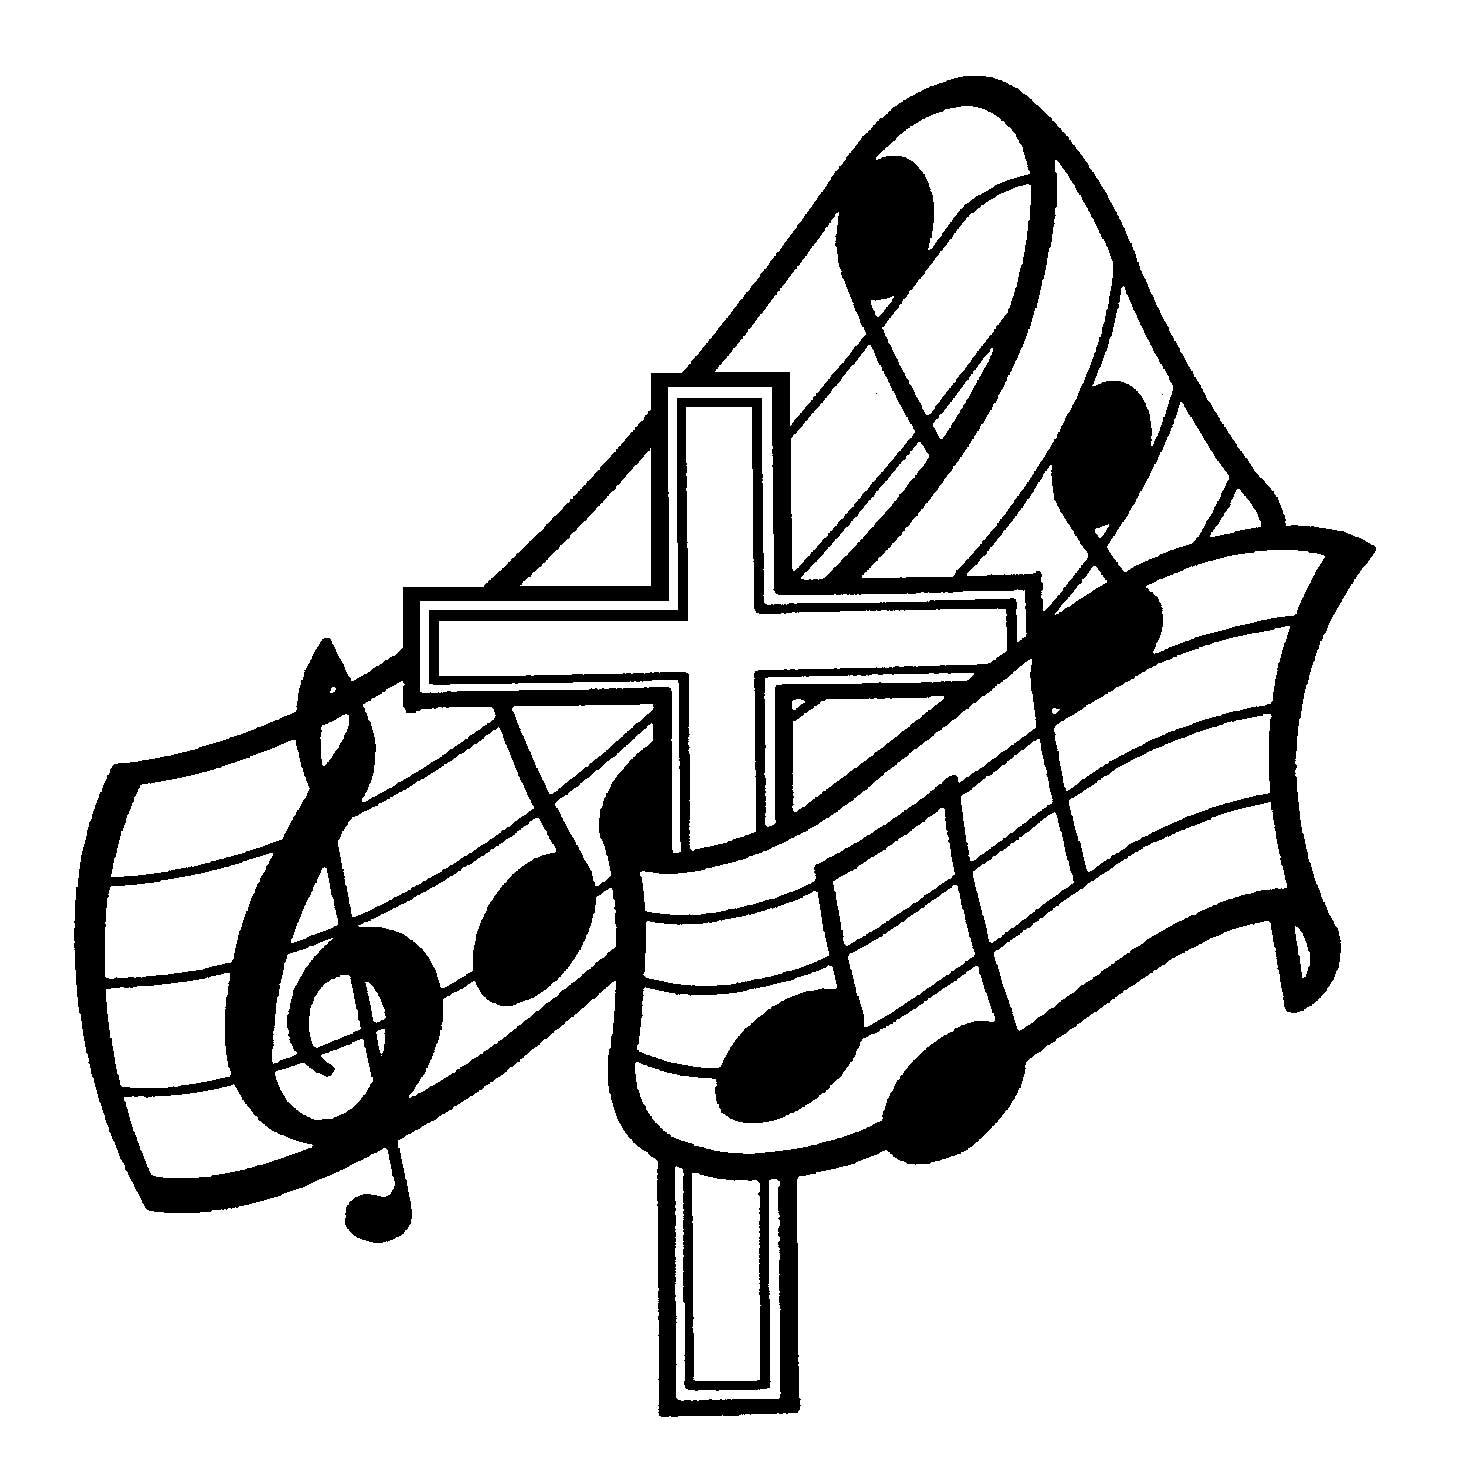 Christian concert clipart